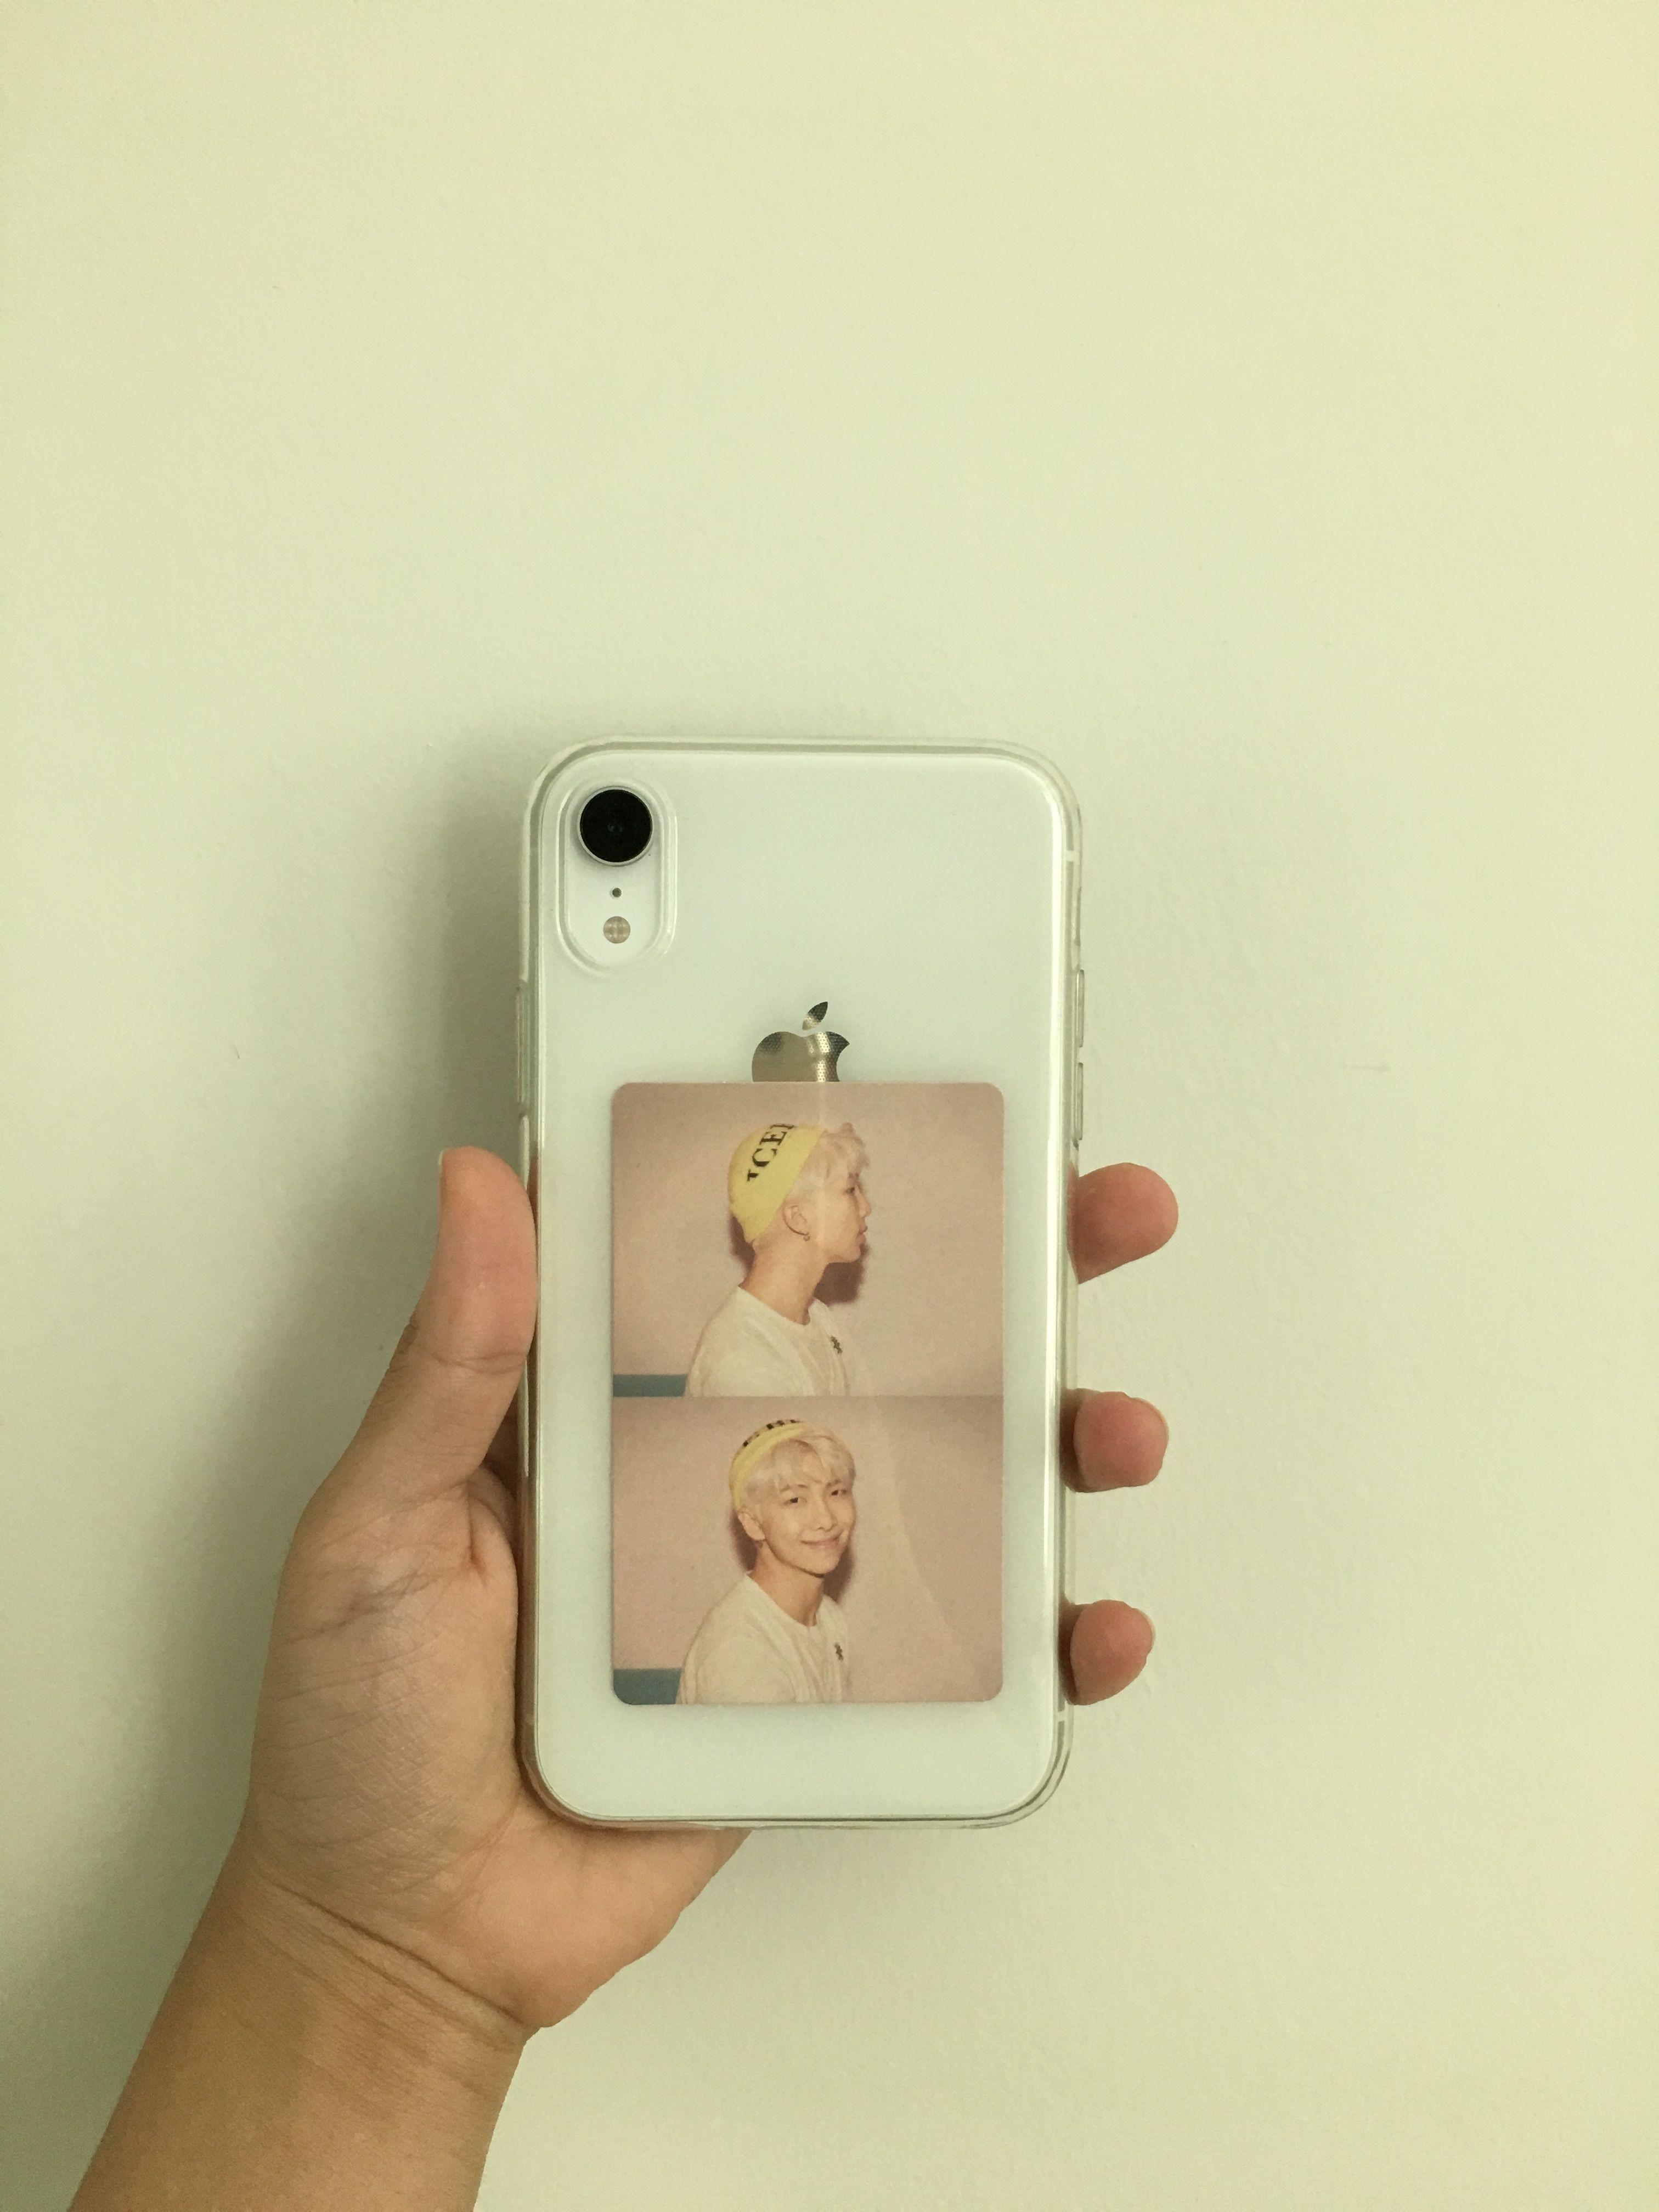 Bts Aesthetics Diy Iphone Case Diy Phone Case Aesthetic Phone Case